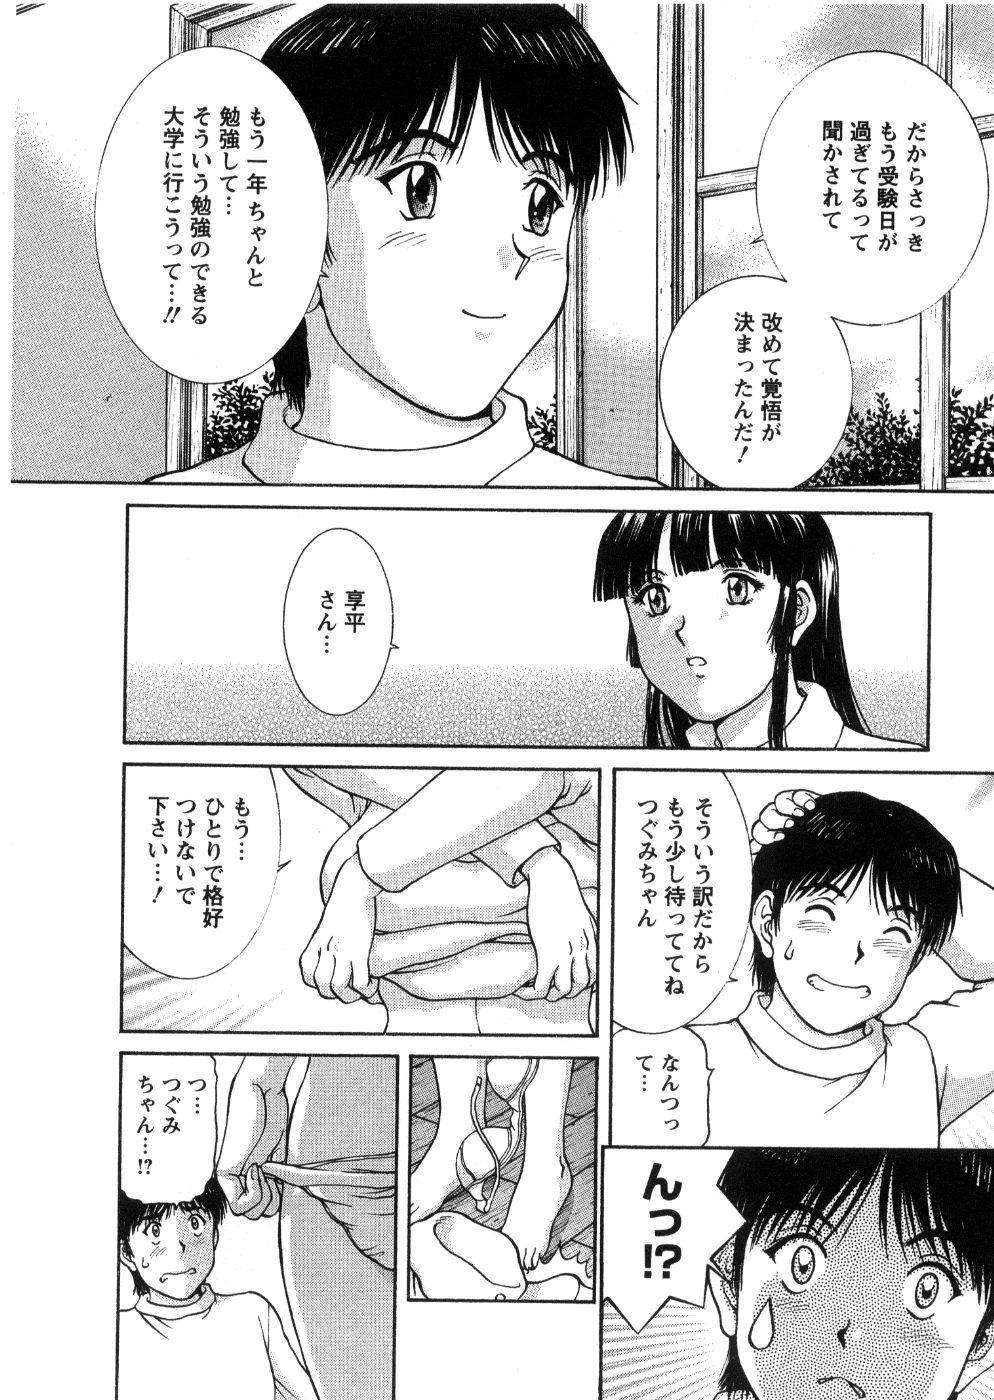 Oneechan-tachi ga Yatte Kuru 03 61